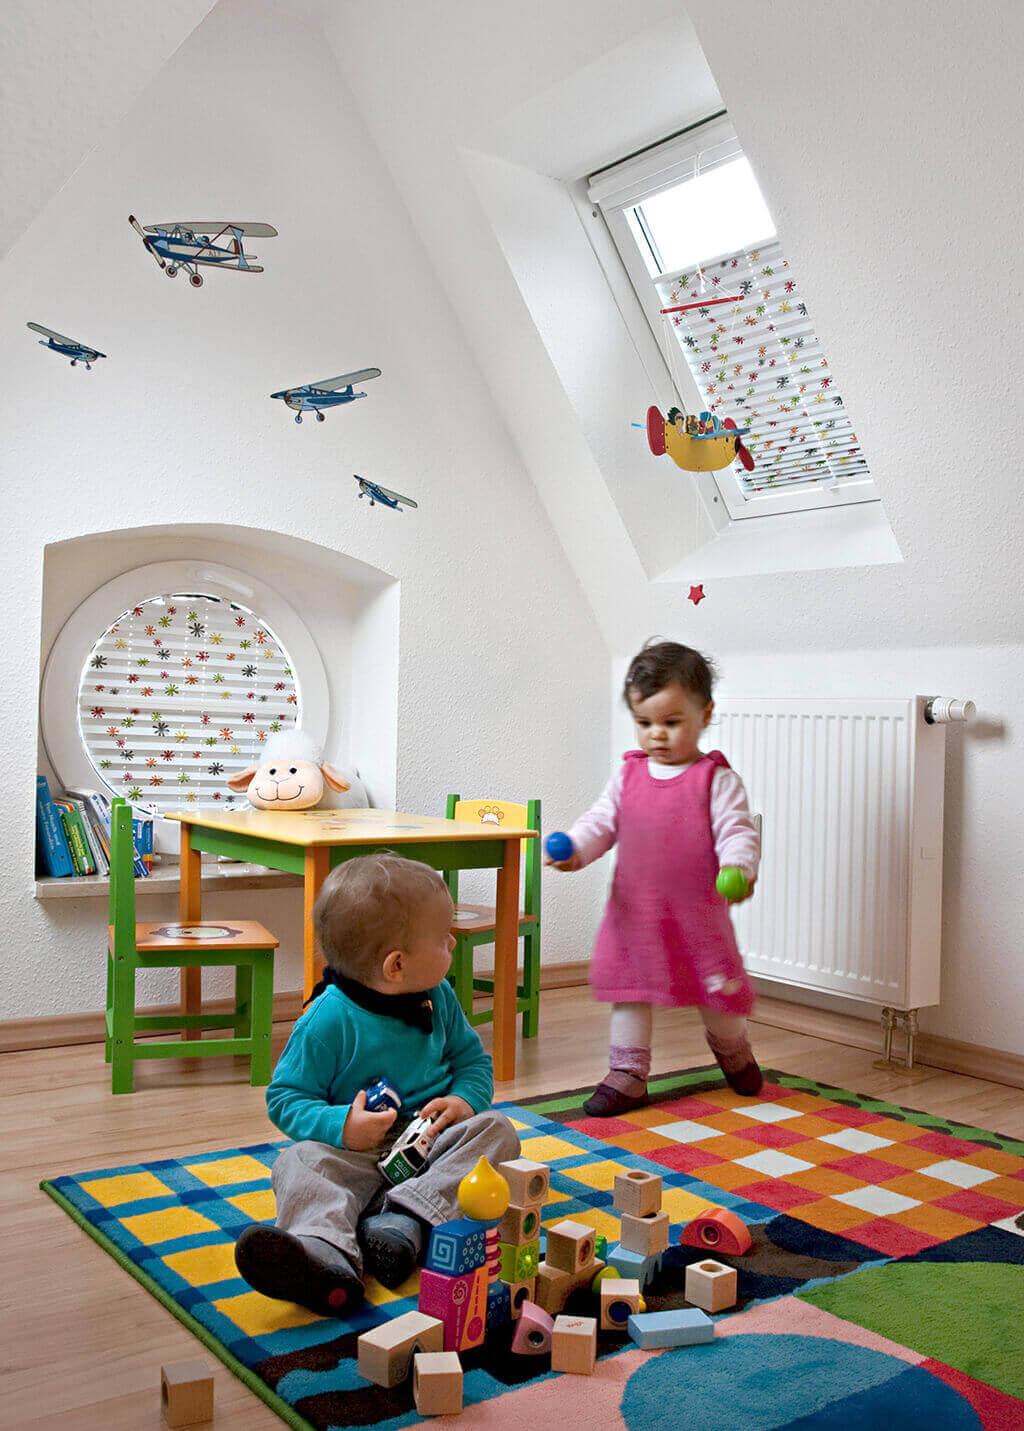 Full Size of Regale Kinderzimmer Regal Weiß Sofa Kinderzimmer Verdunkelungsrollo Kinderzimmer